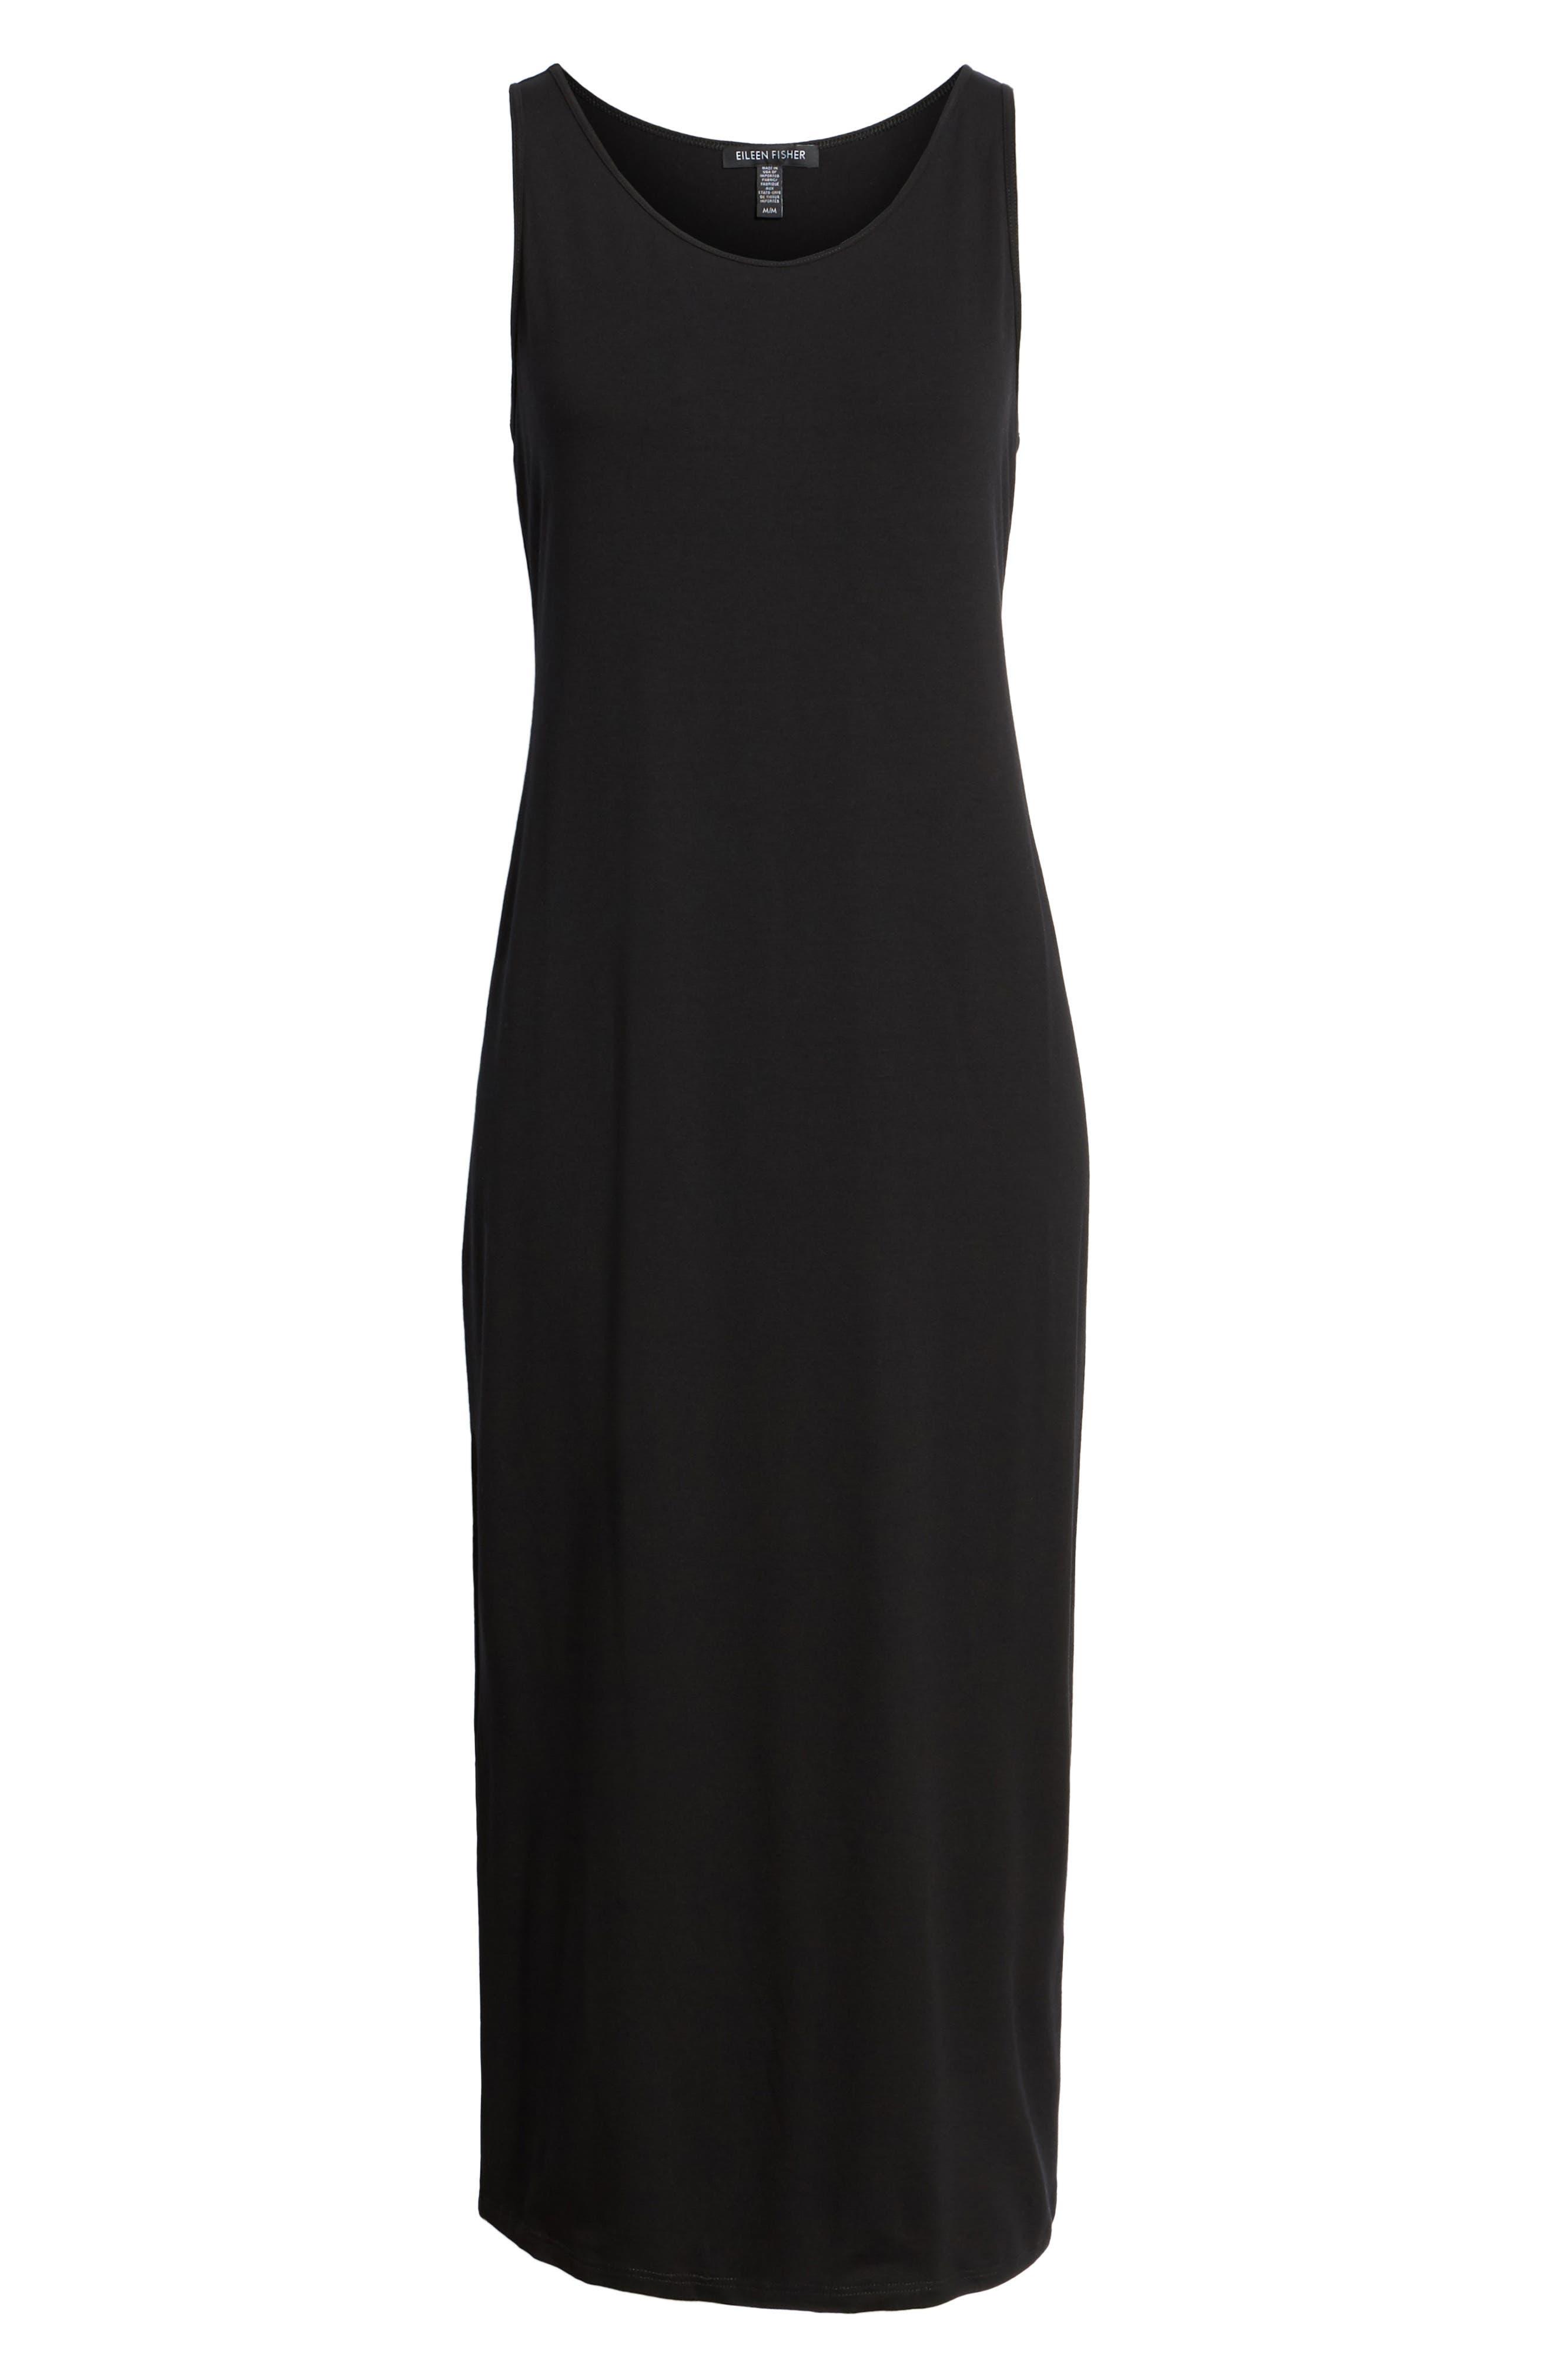 EILEEN FISHER, Midi Tank Dress, Alternate thumbnail 8, color, BLACK